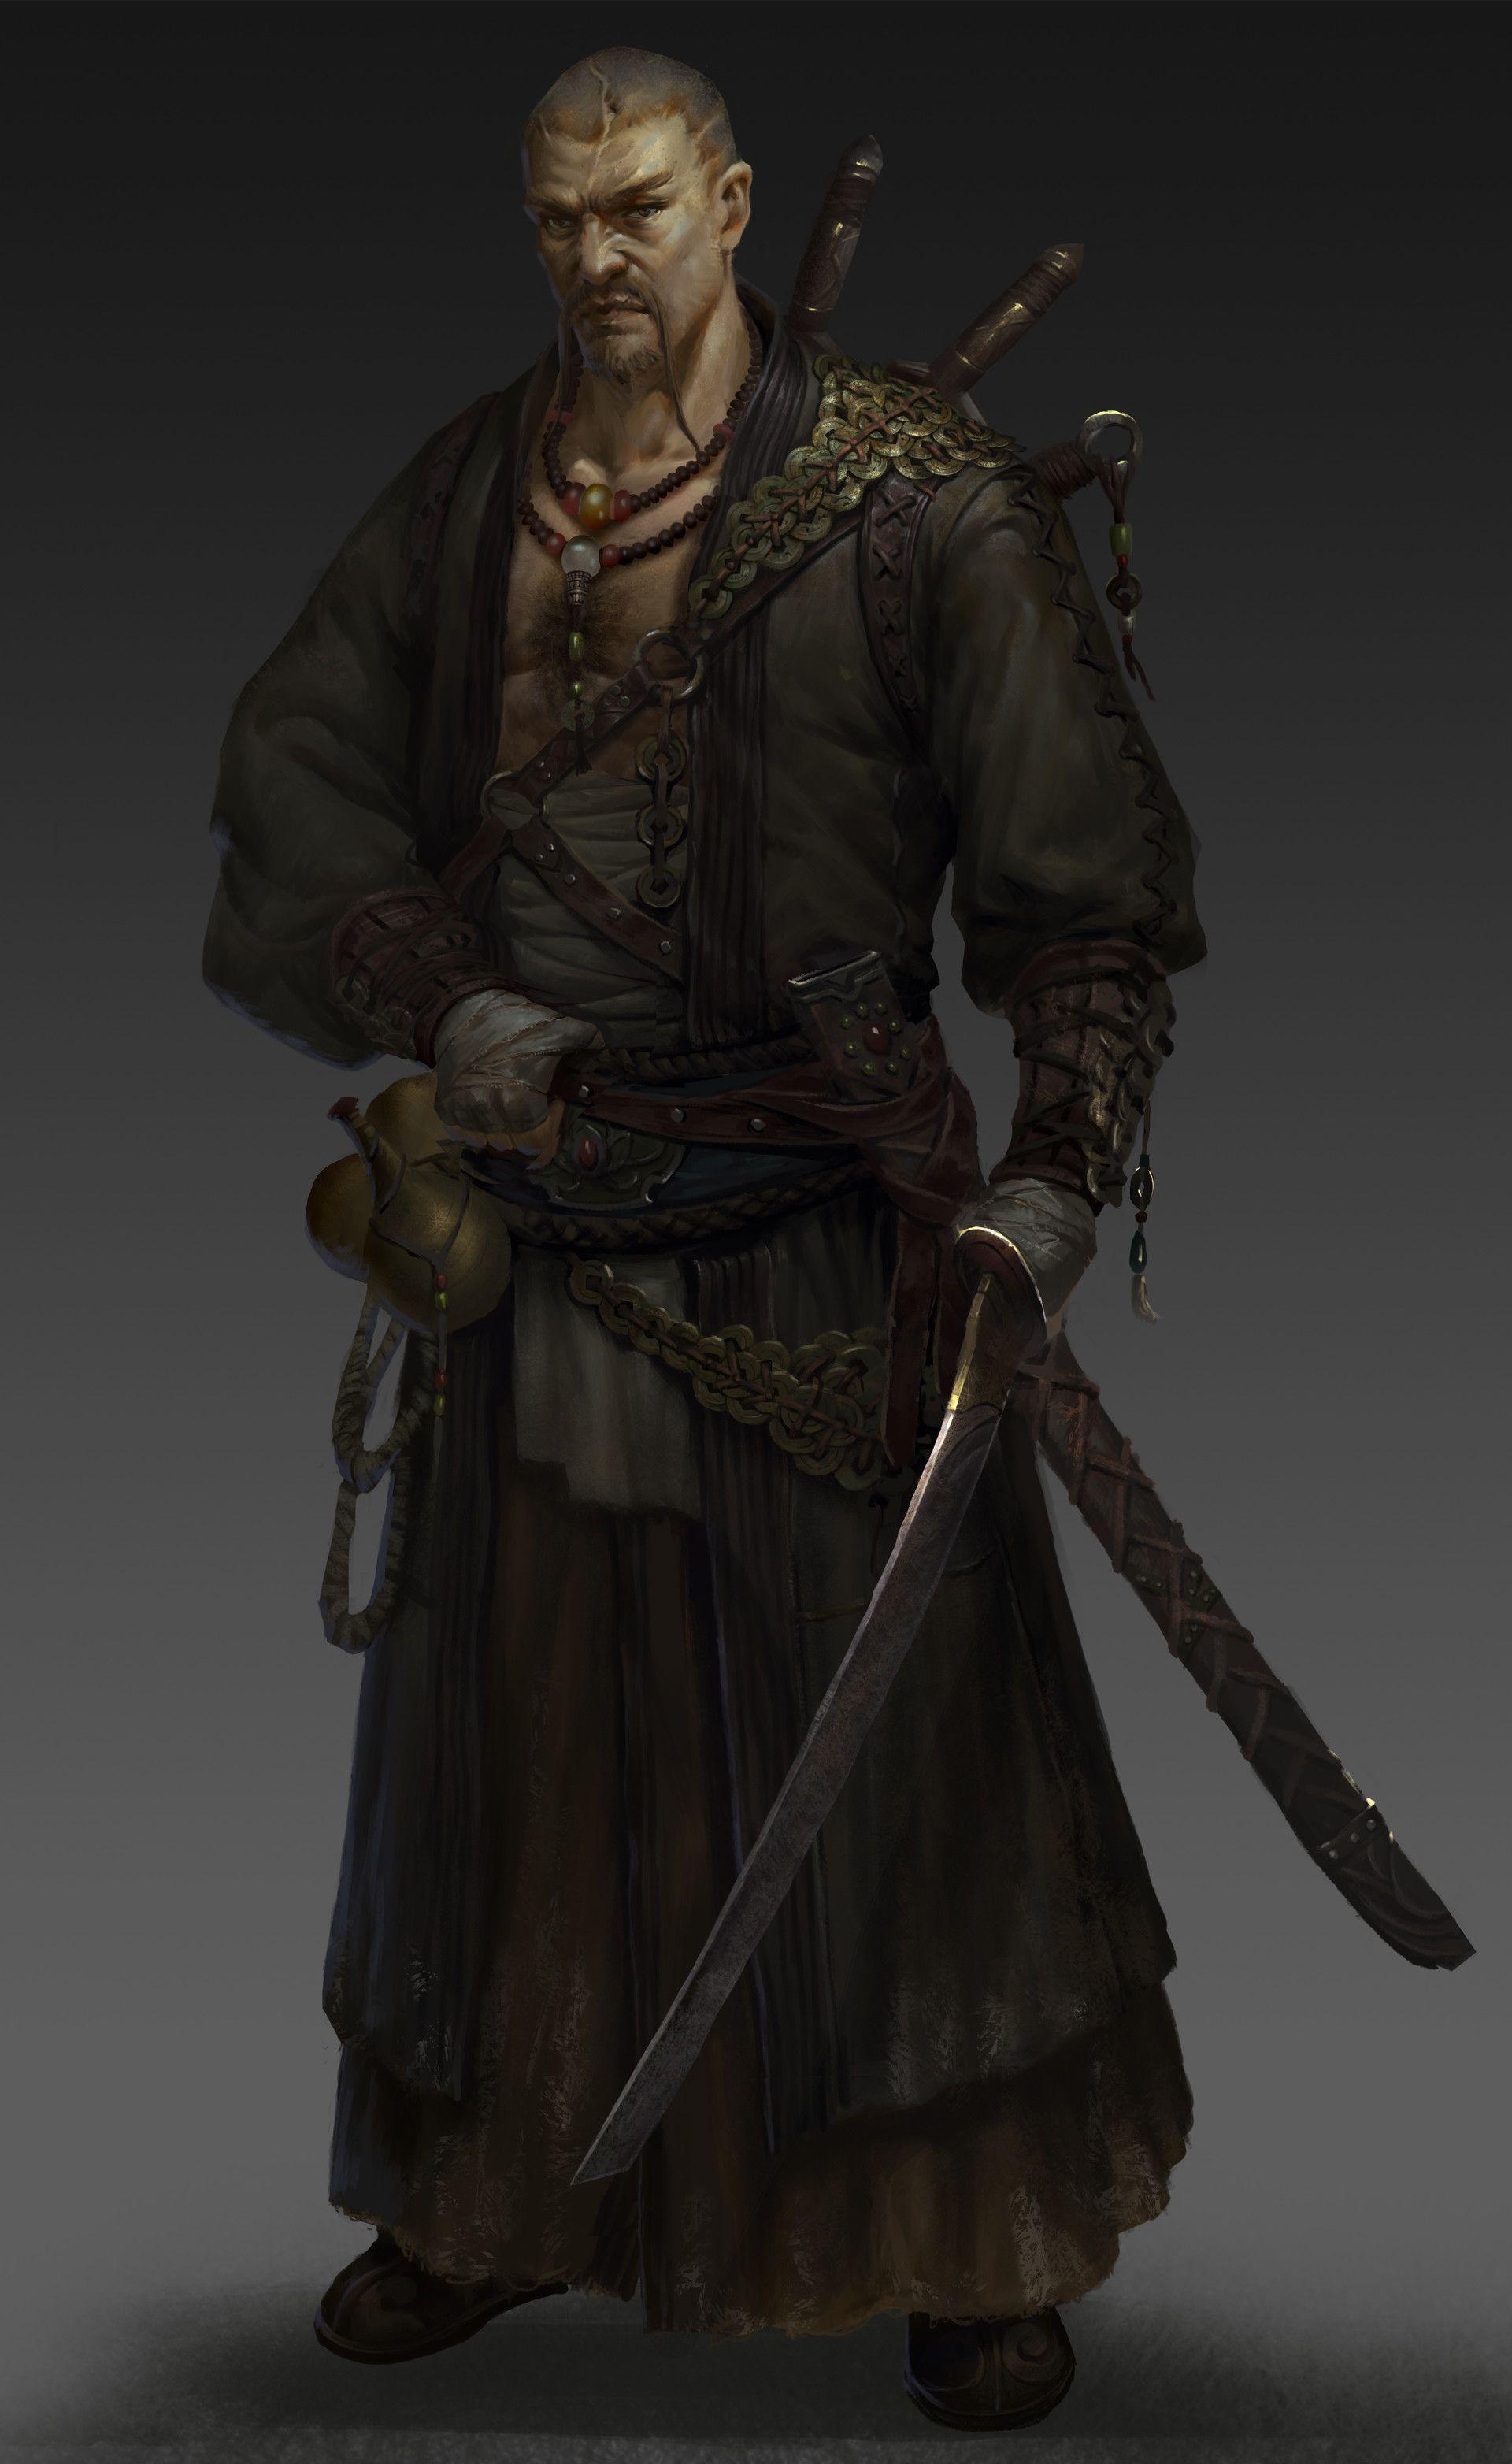 Samurai Elf D&D 5e - Imgur | Samurai art, Samurai artwork, Art